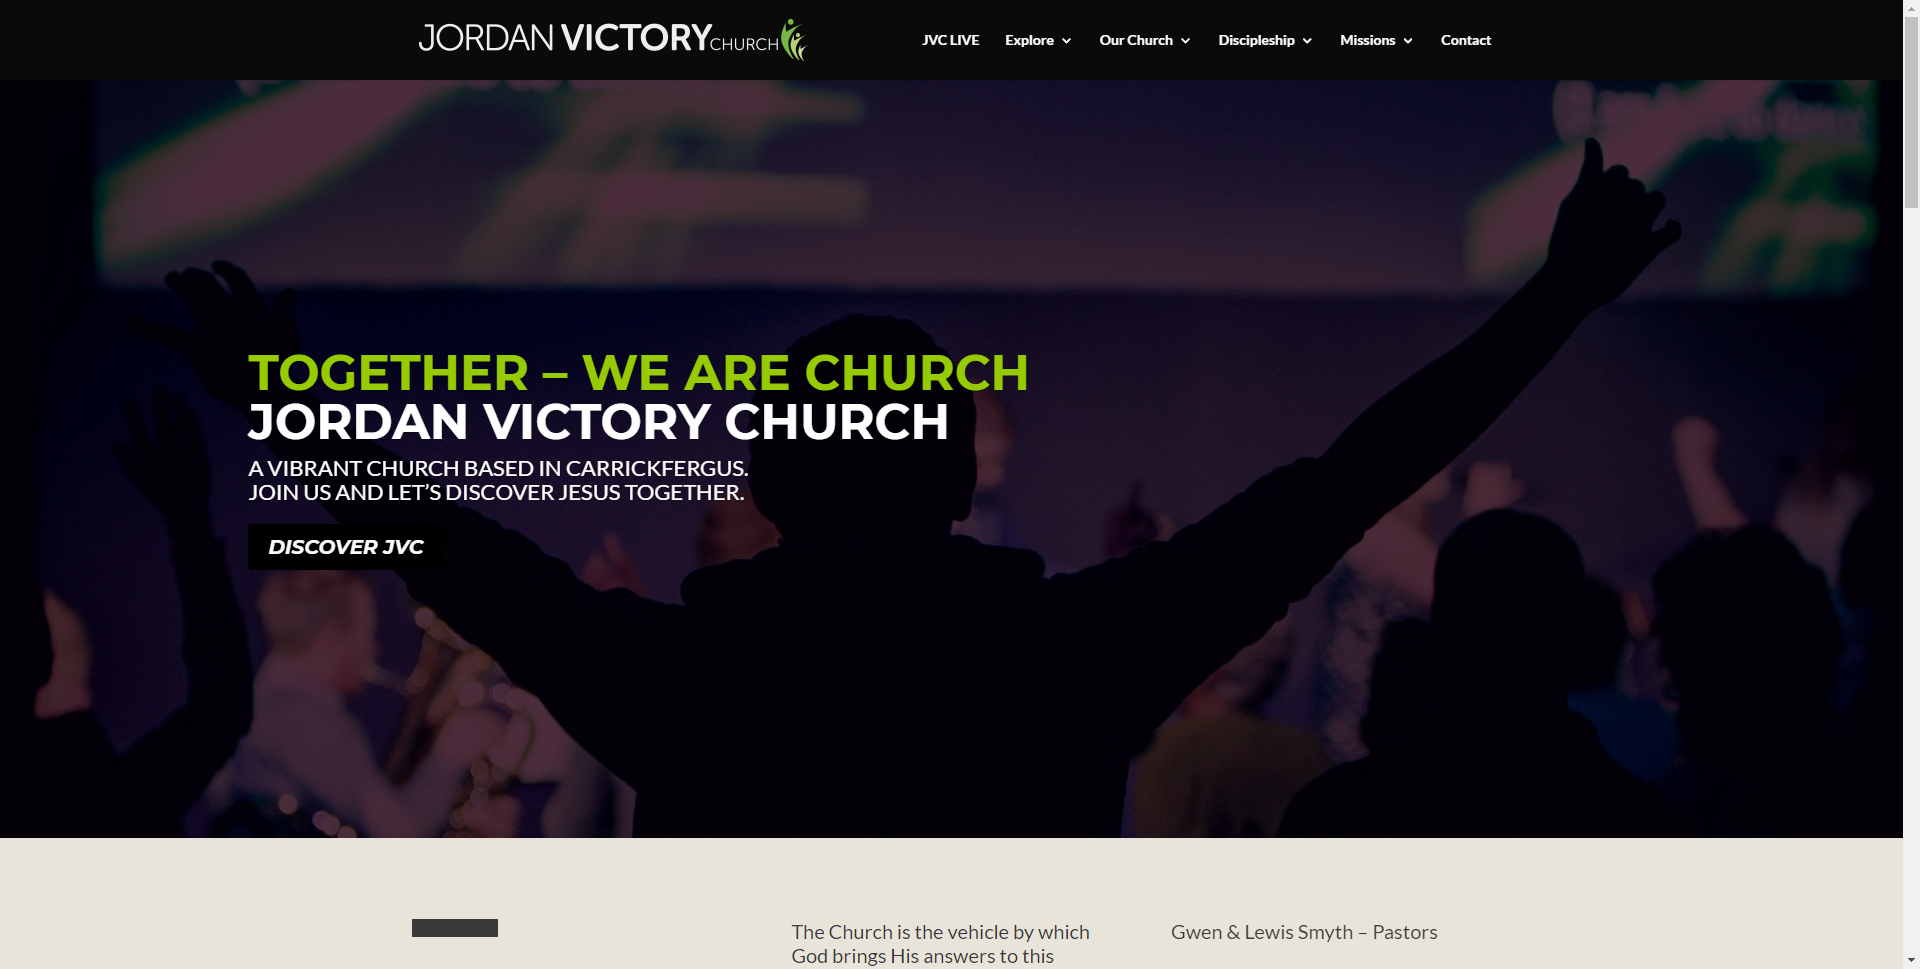 teamjvc.org Websites